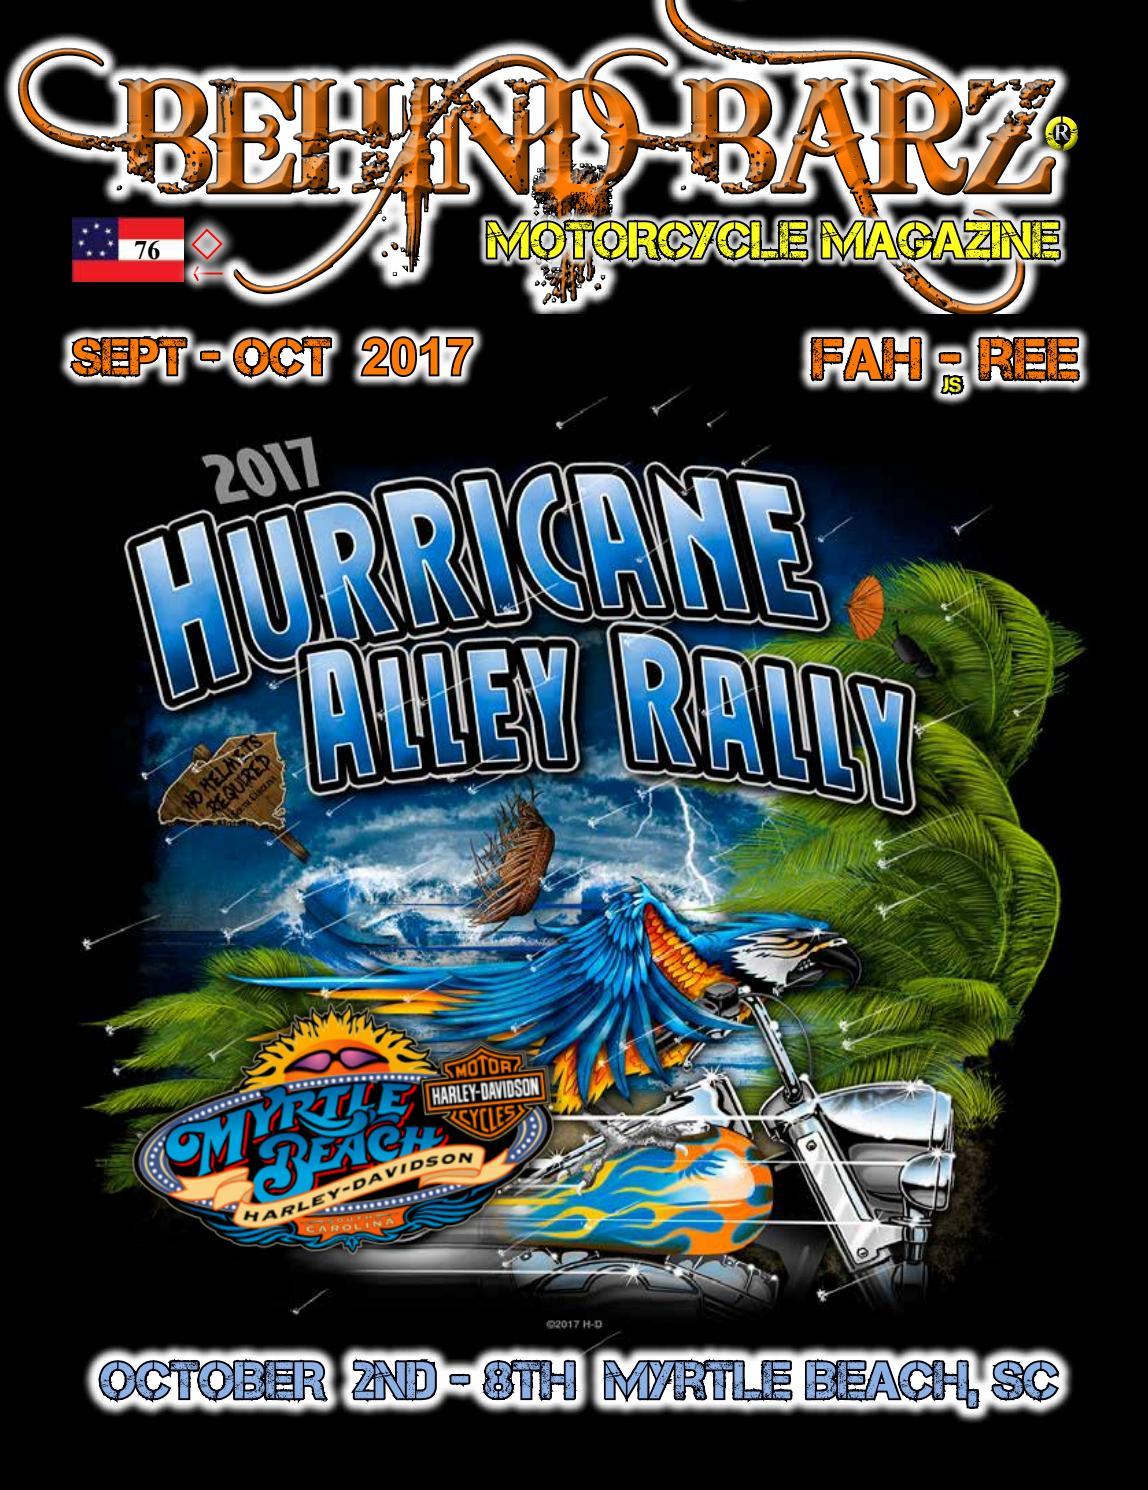 American Pickers Pikeville Nc behind barz motorcycle mag sept 2017behind barz